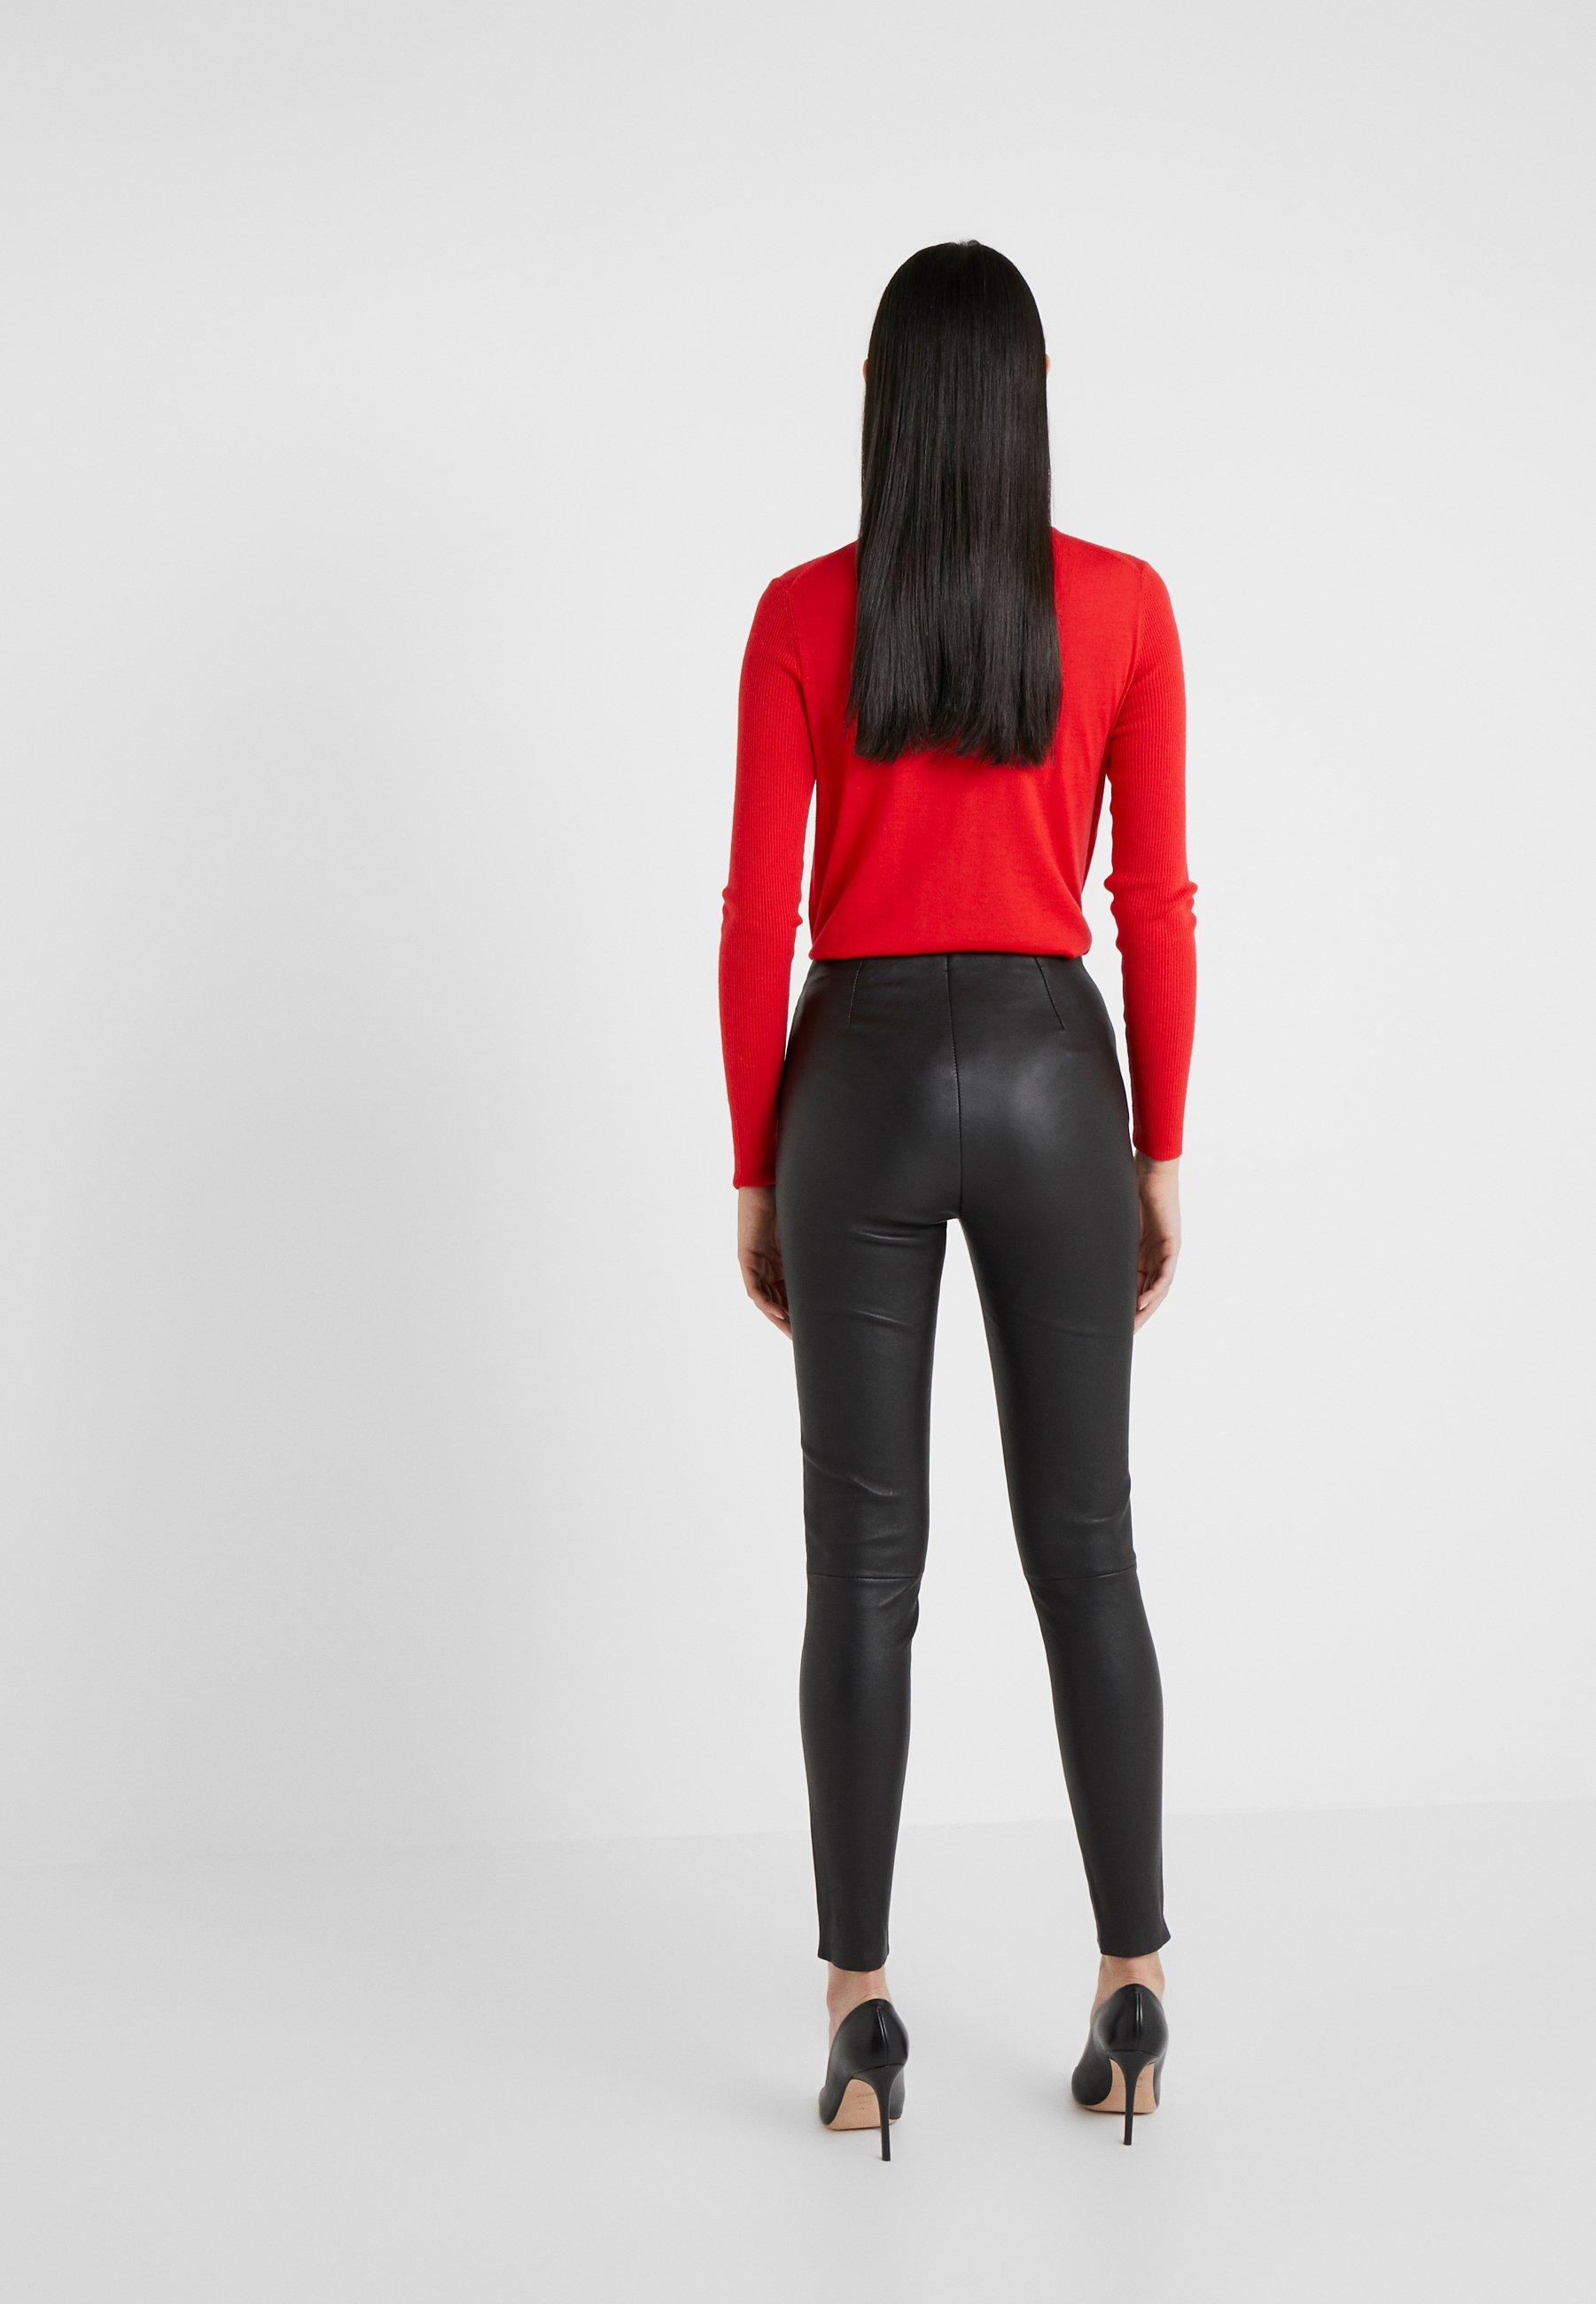 Professional Women's Clothing STUDIO ID LENA Leggings Trousers black nFRrZE5iE